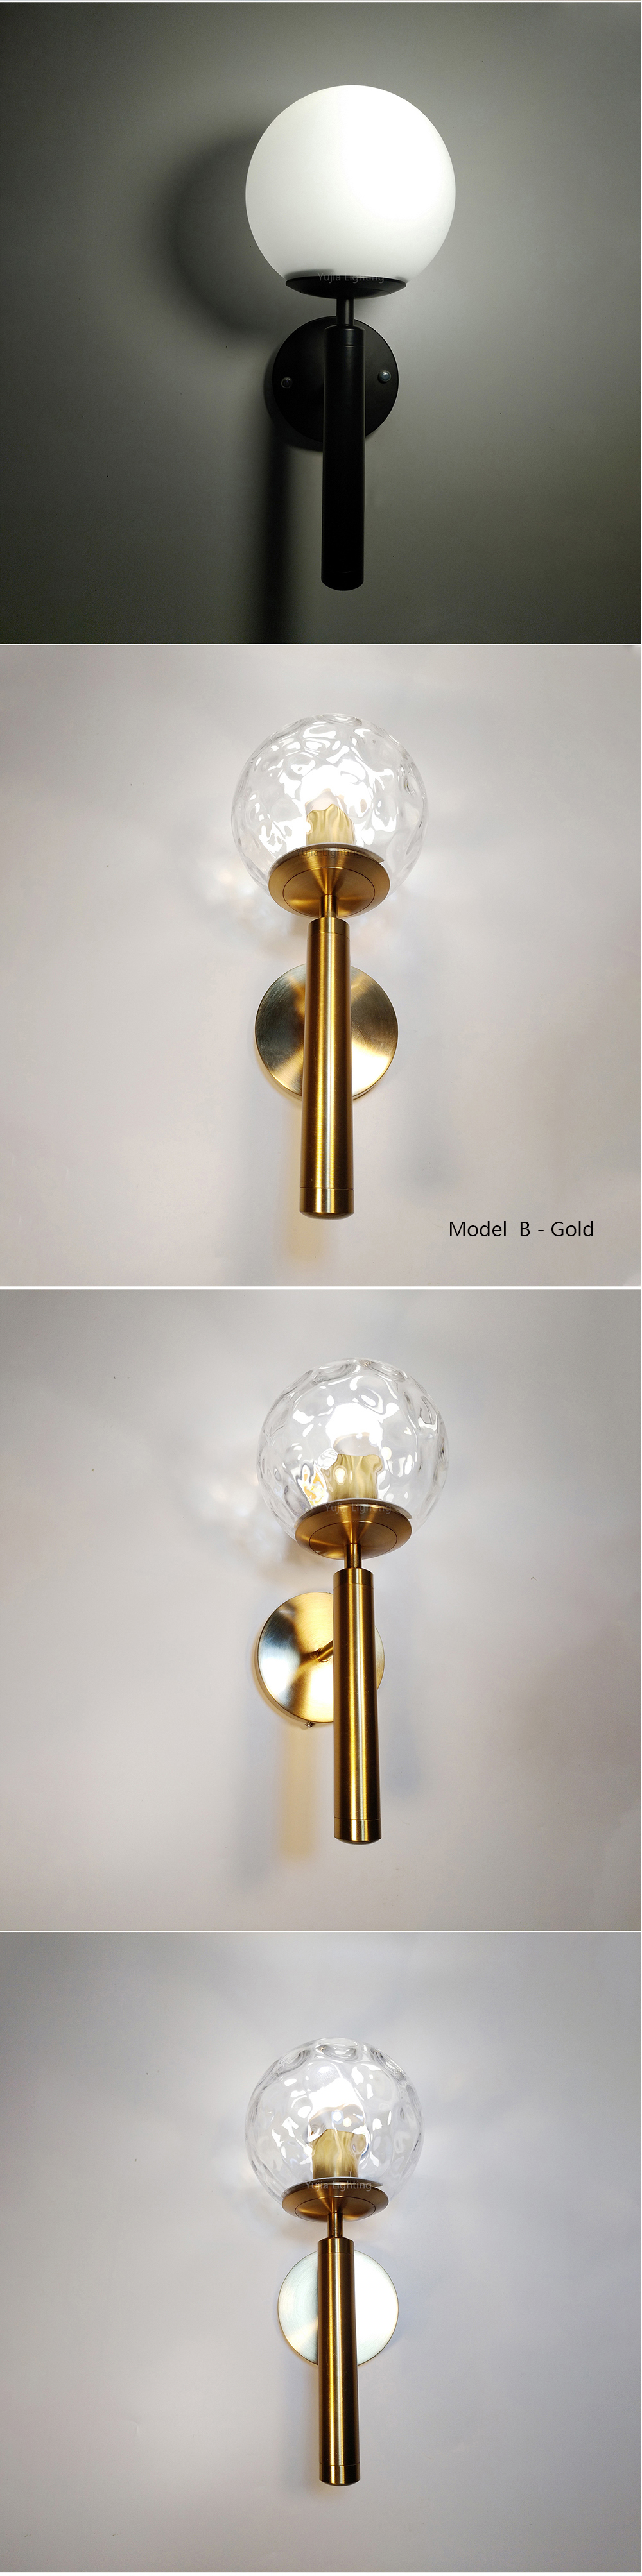 bola vidro wandlamp up down espelho do